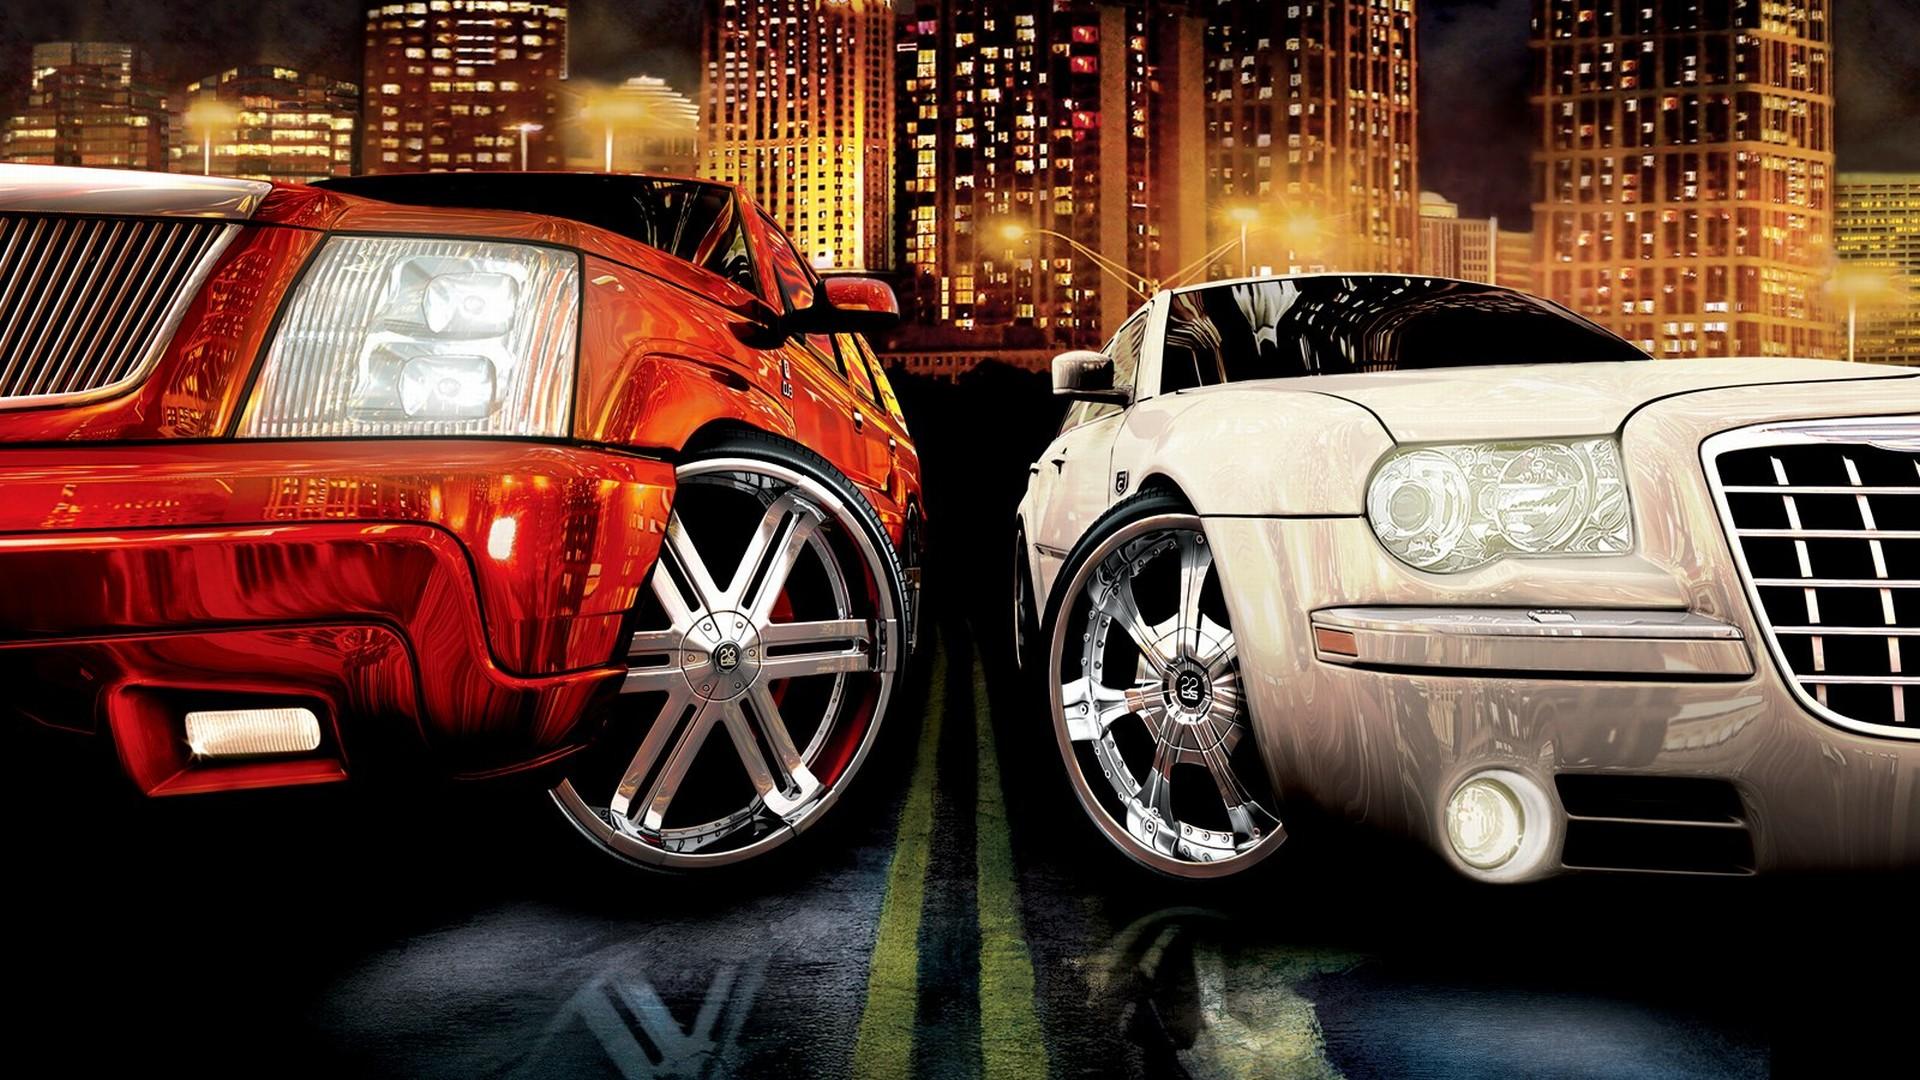 Midnight Club 3: DUB Edition - Game Racing PS2